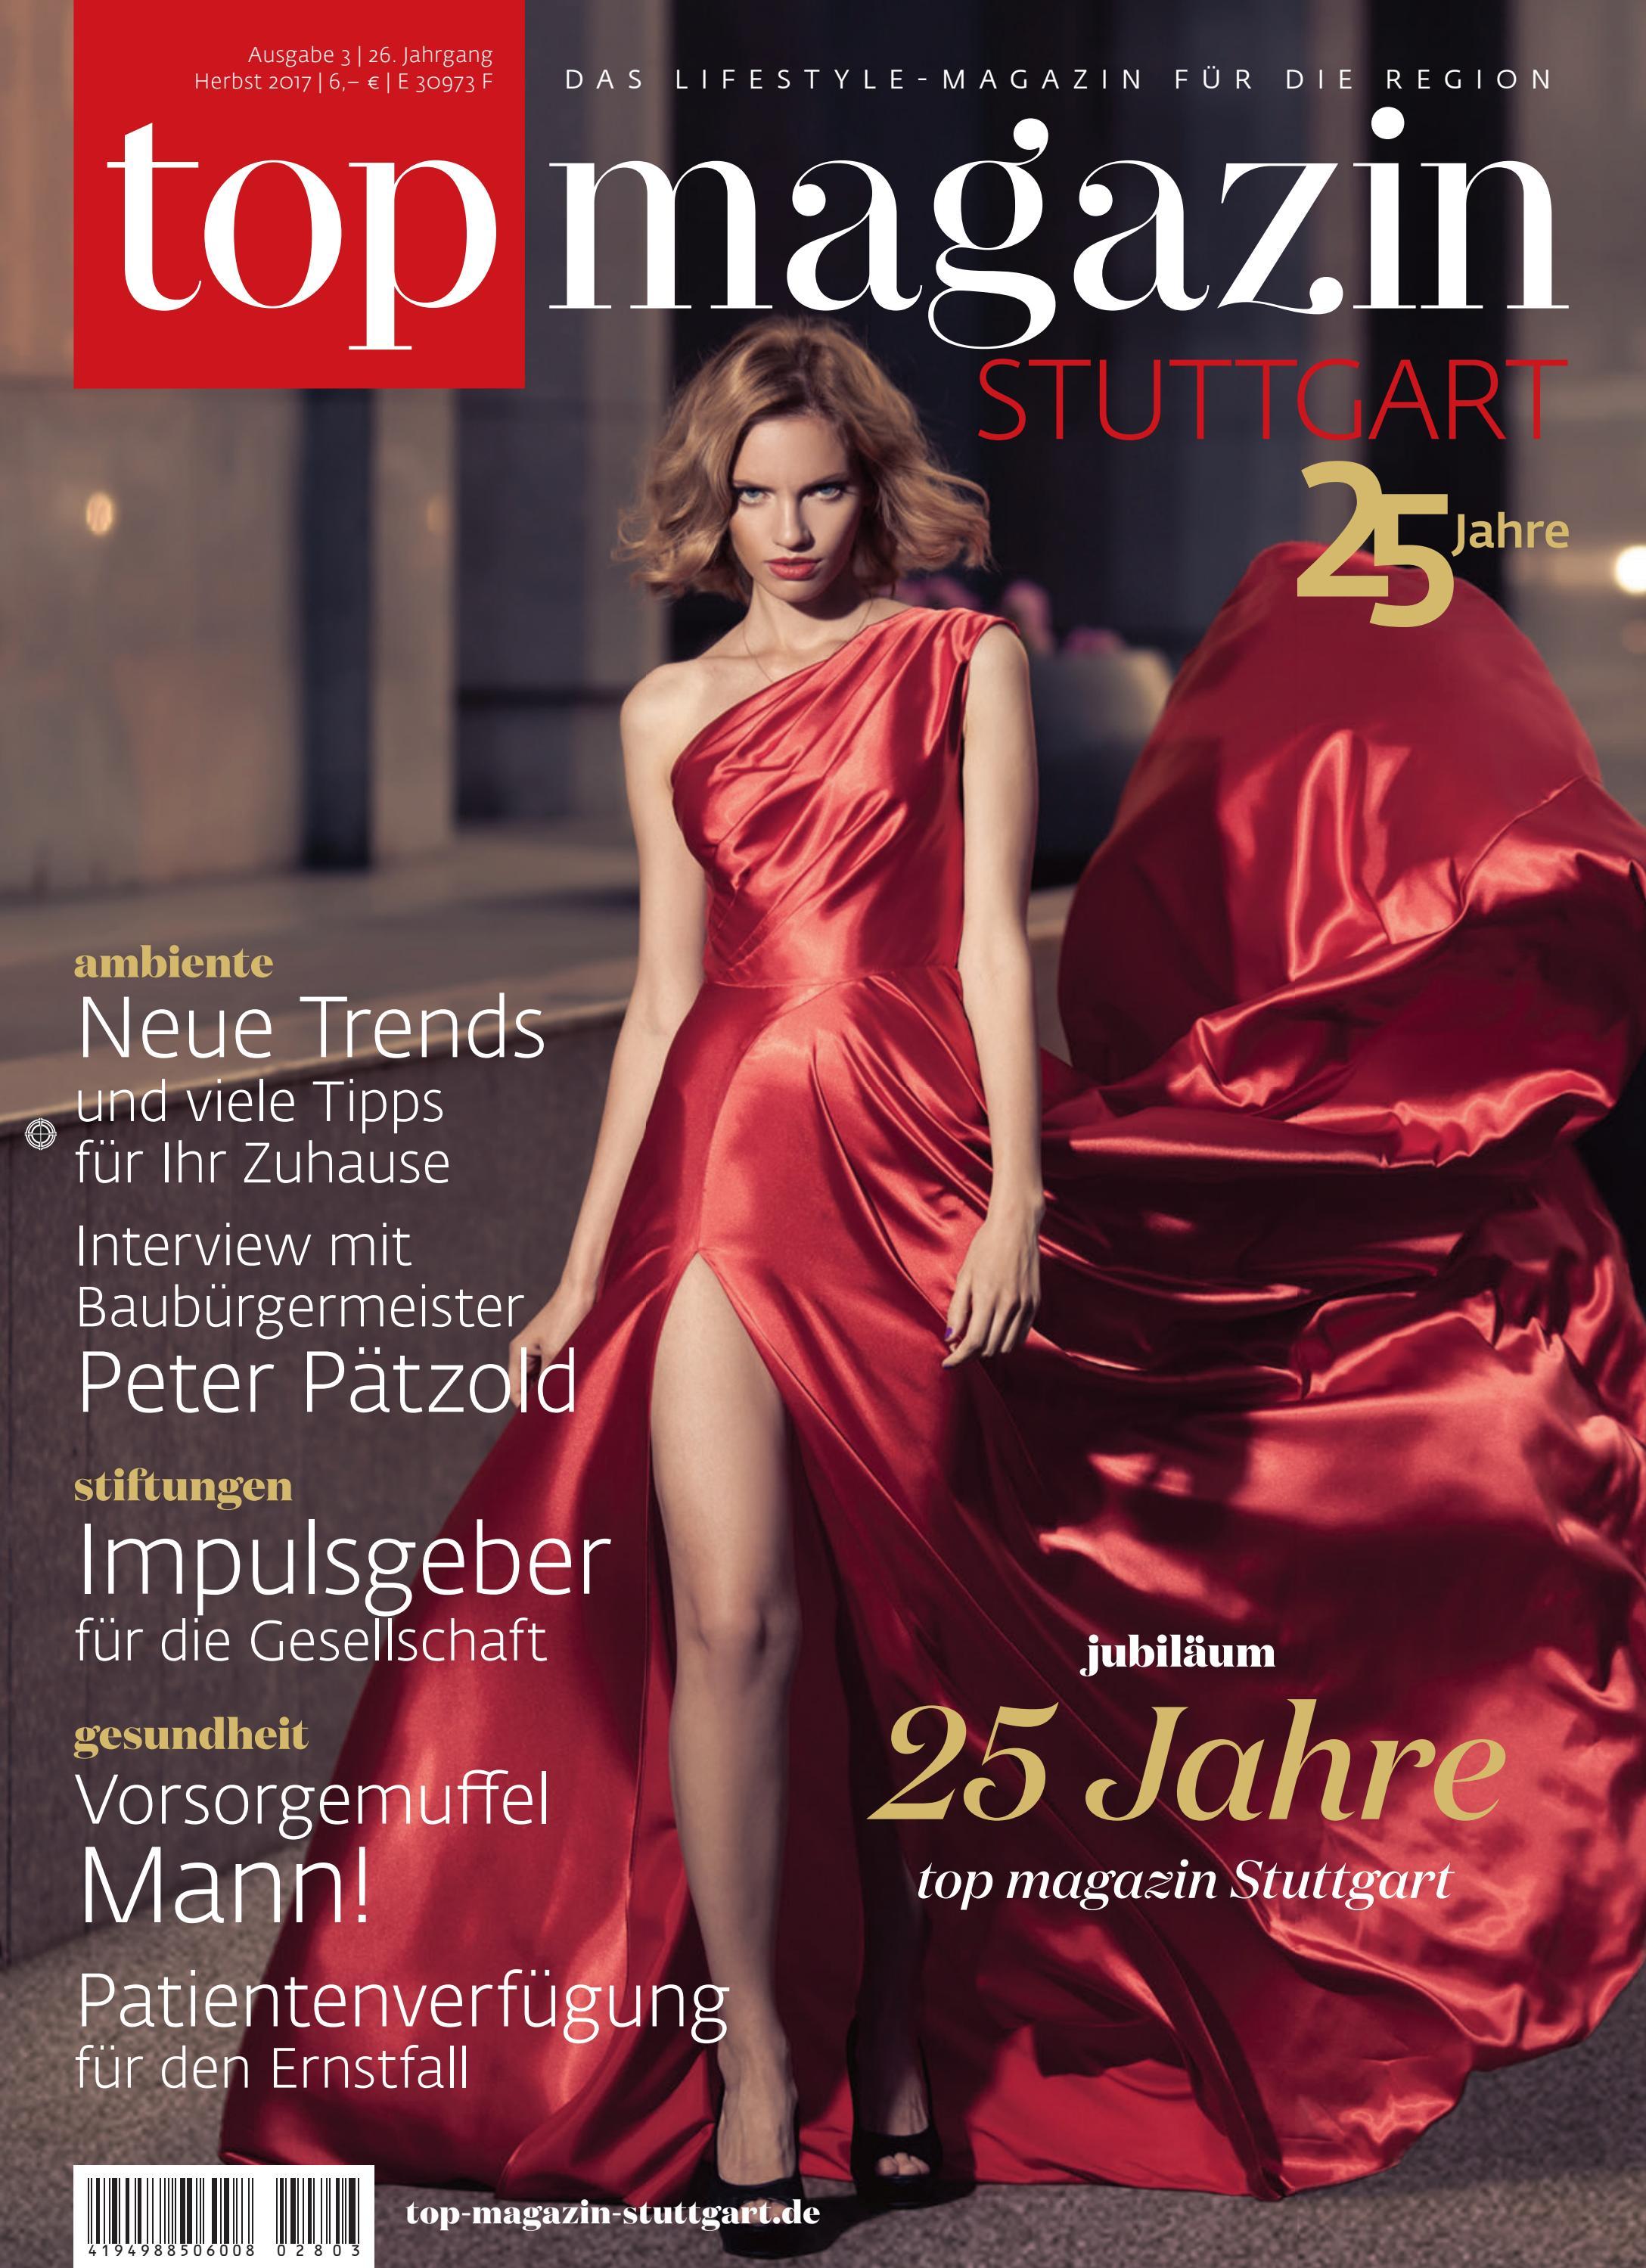 Top Magazin Stuttgart Herbst 2017 by Top Magazin issuu